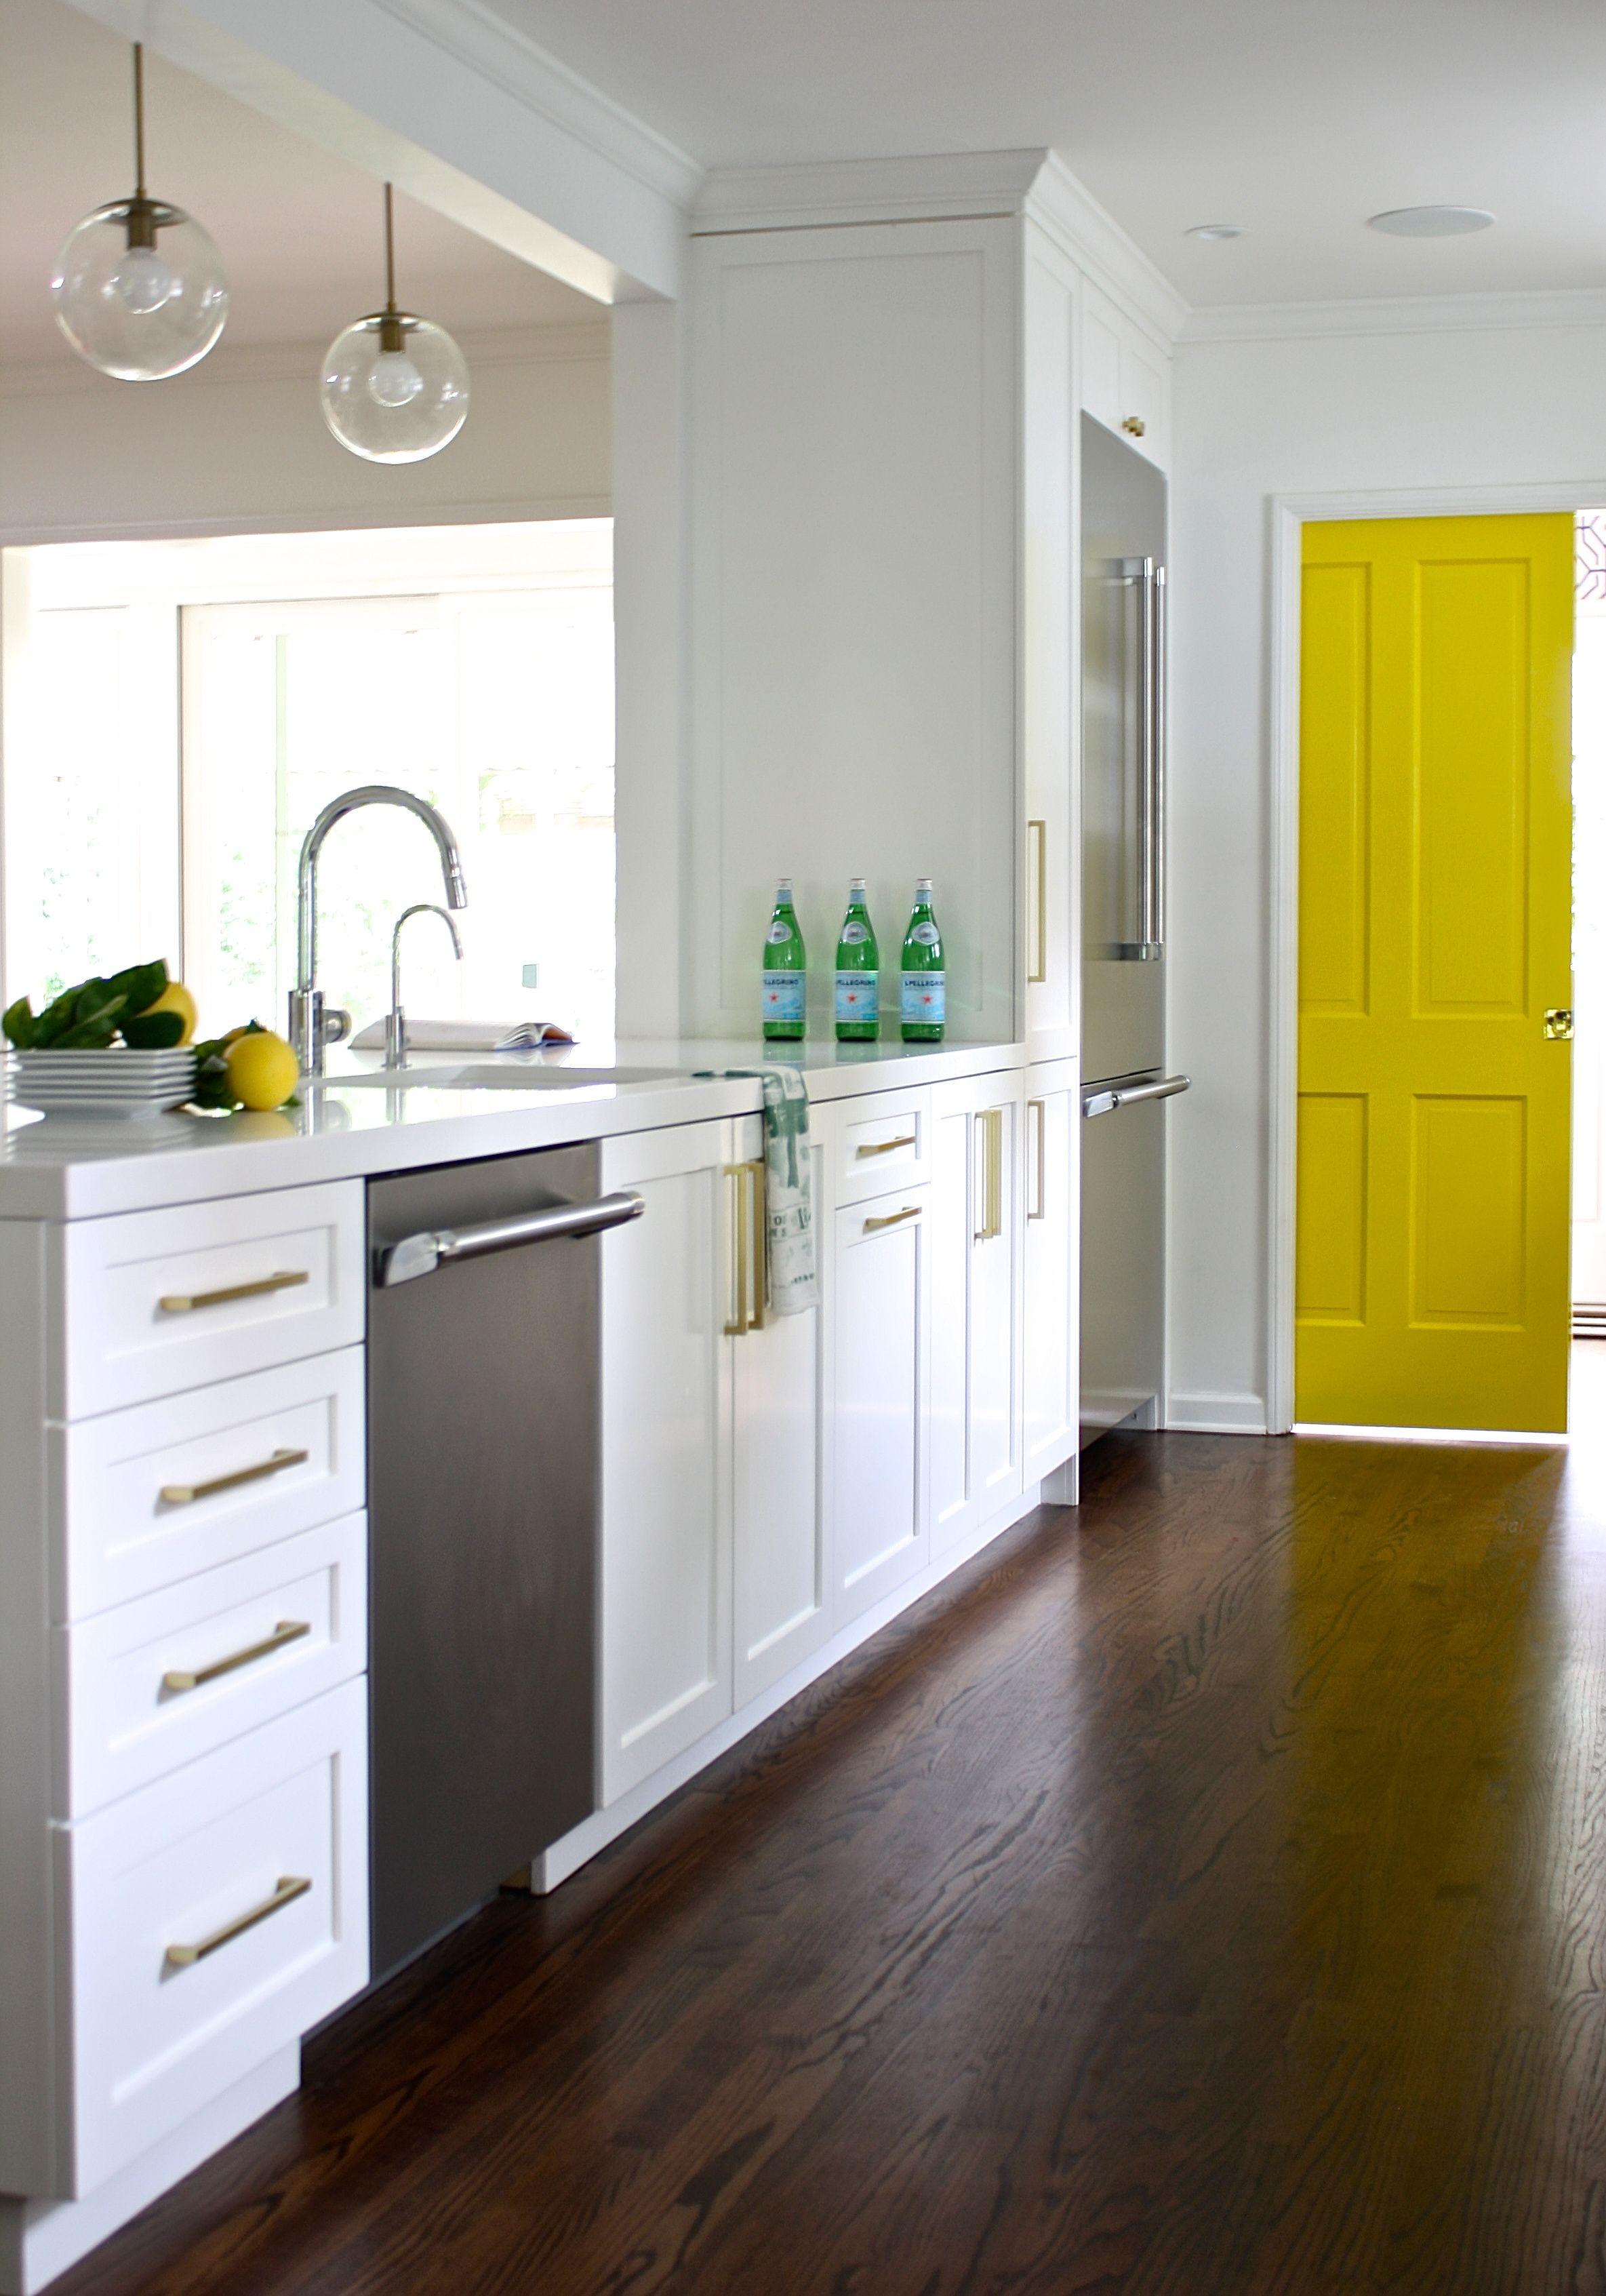 white kitchen shaker cabinet brass pulls yellow pocket door